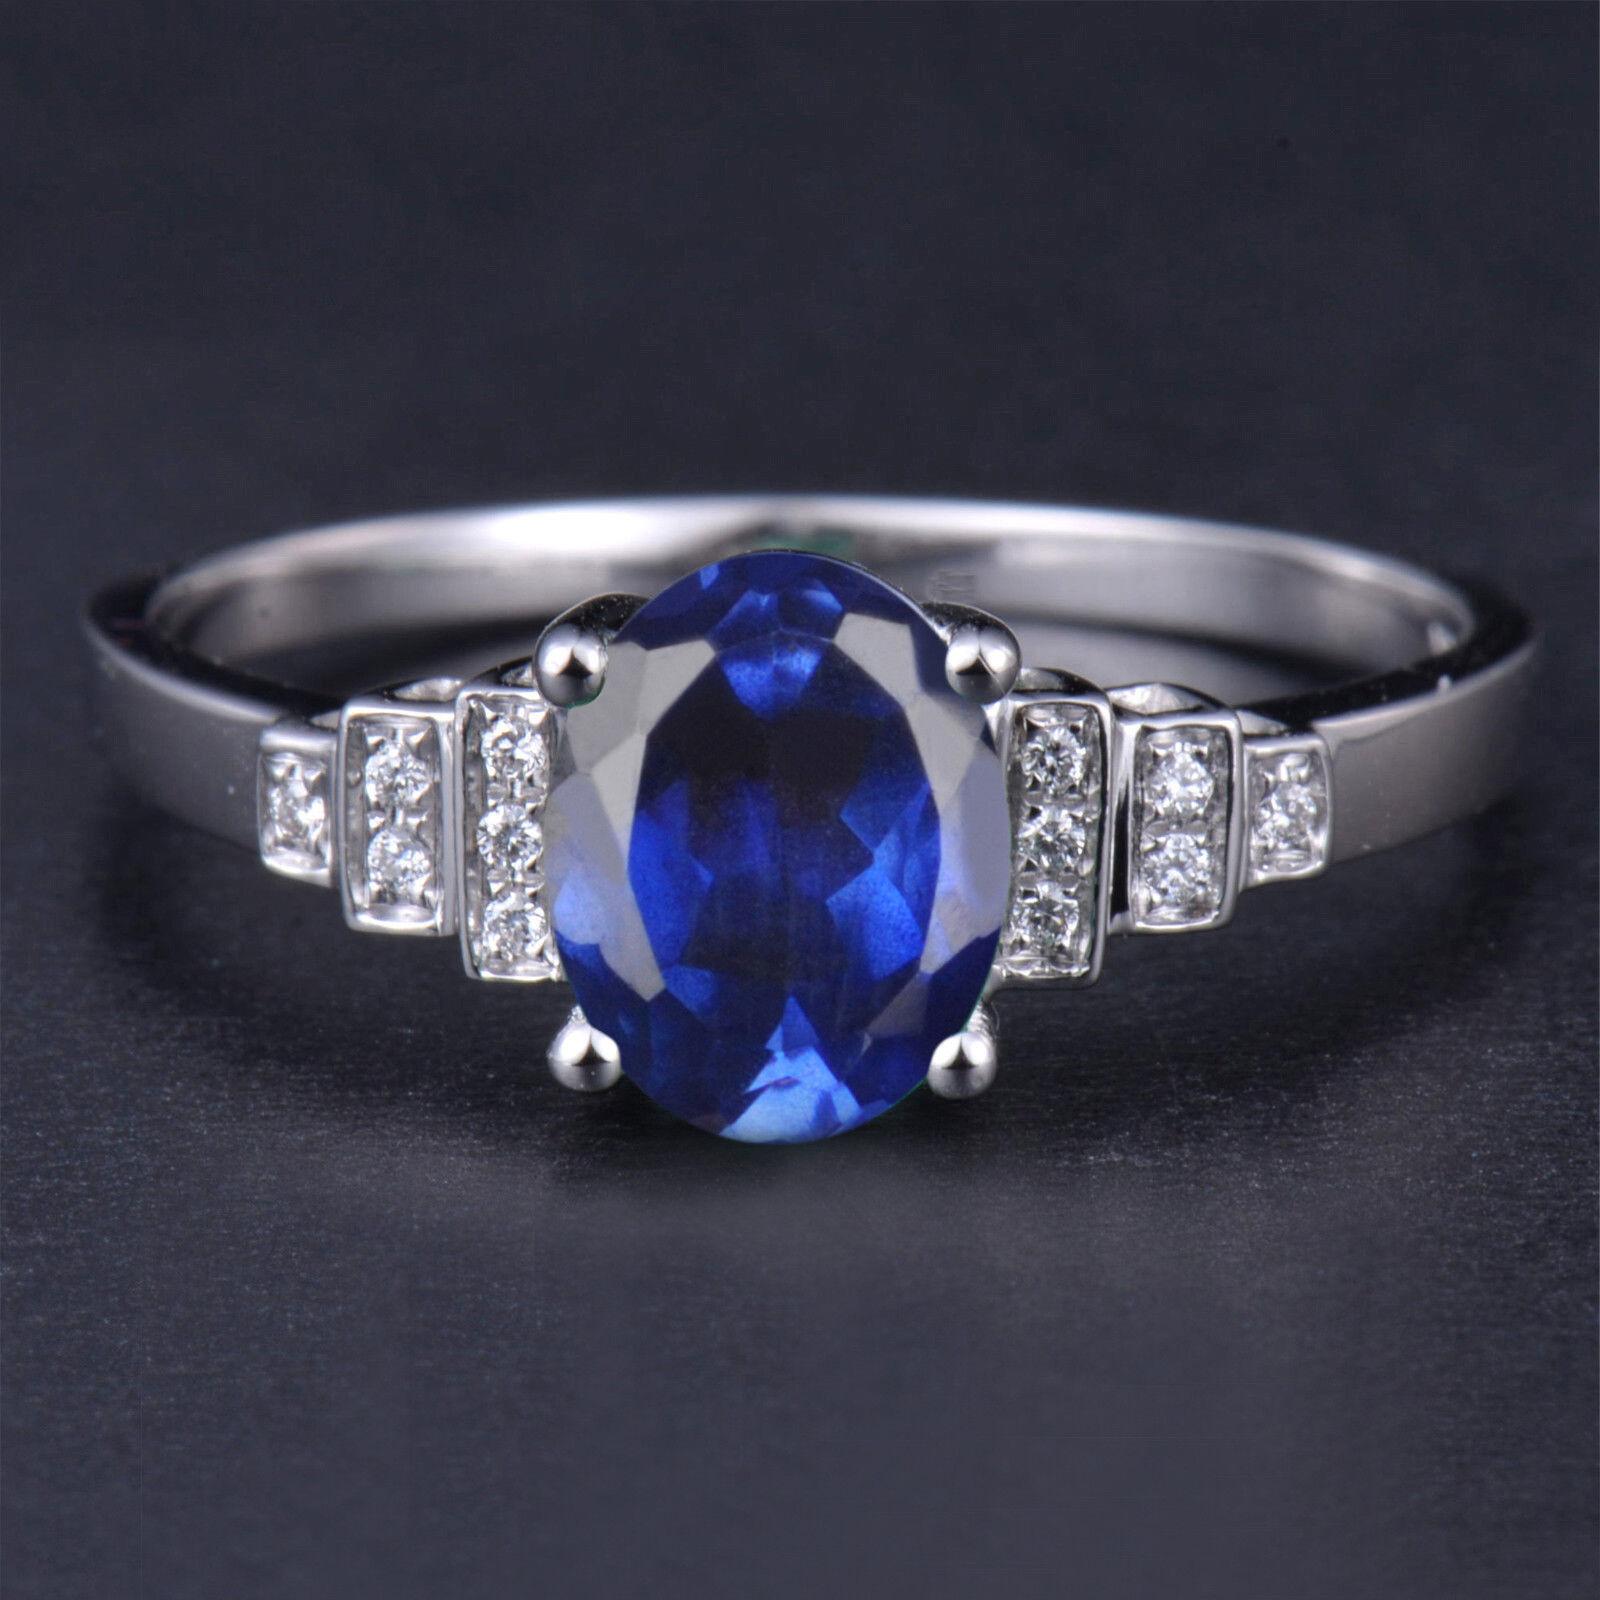 0f69613b8fd4b Ring Diamond Certified EGL Carat Tanzanite bluee Natural In 1.75 ...